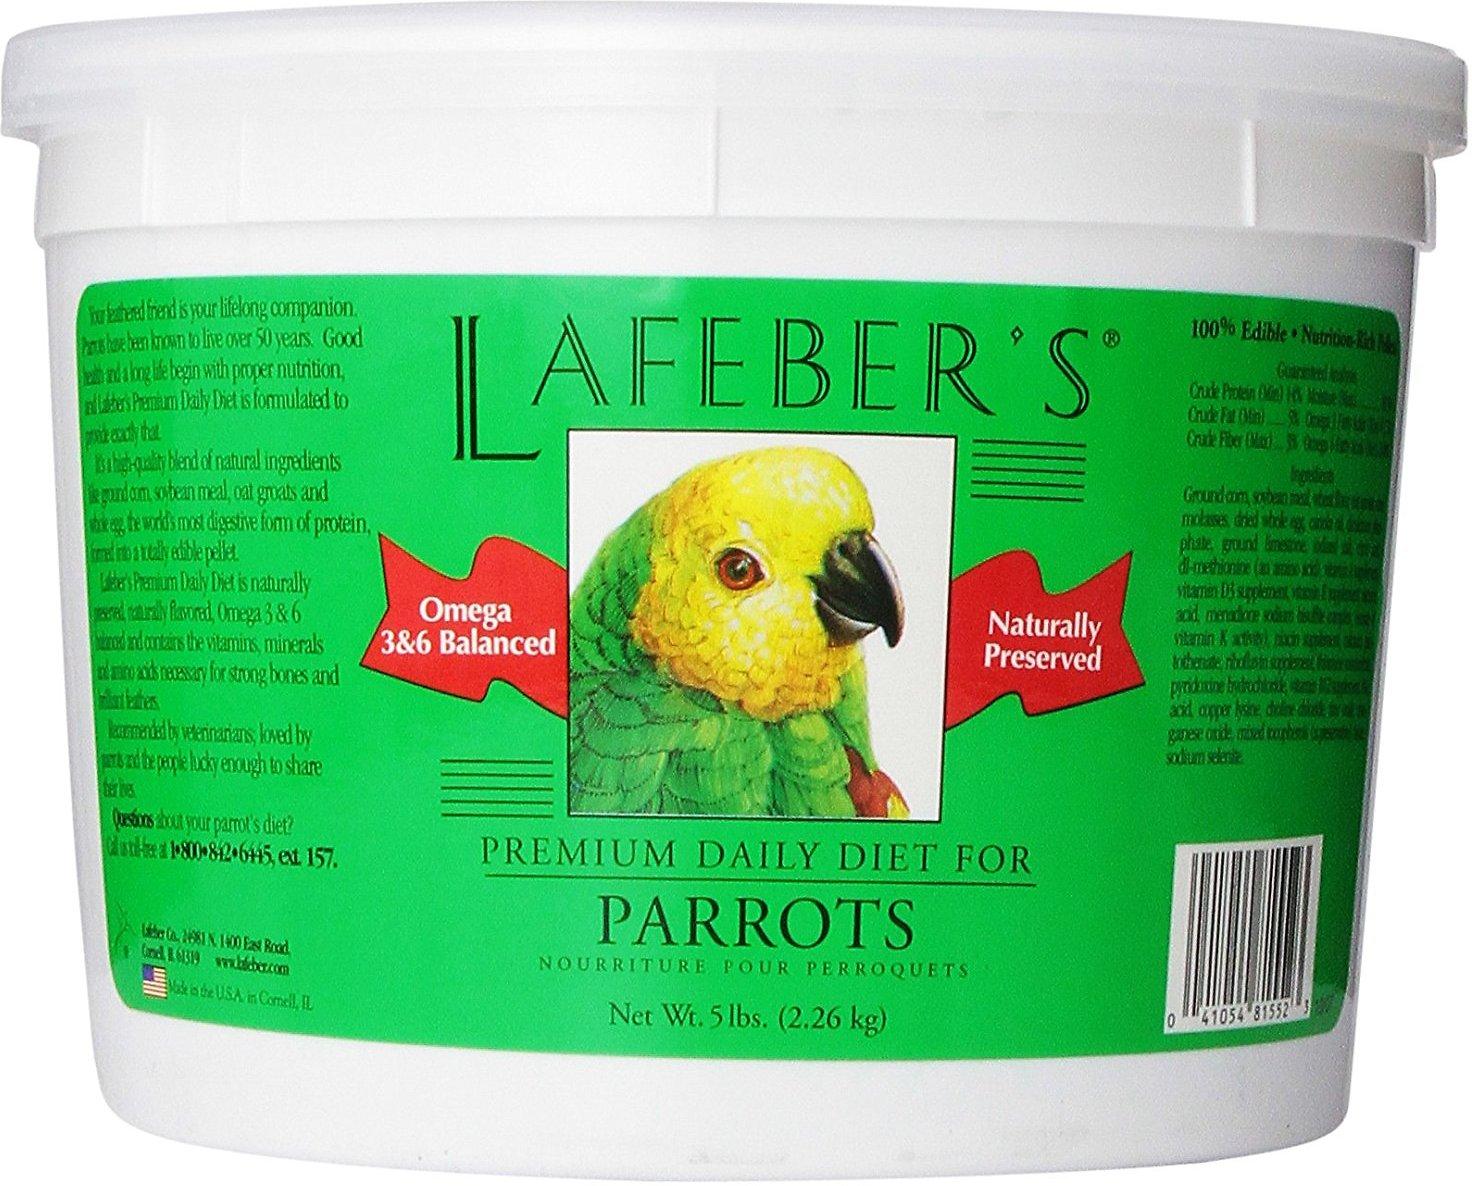 Lafeber Premium Daily Diet Parrot Bird Food Image